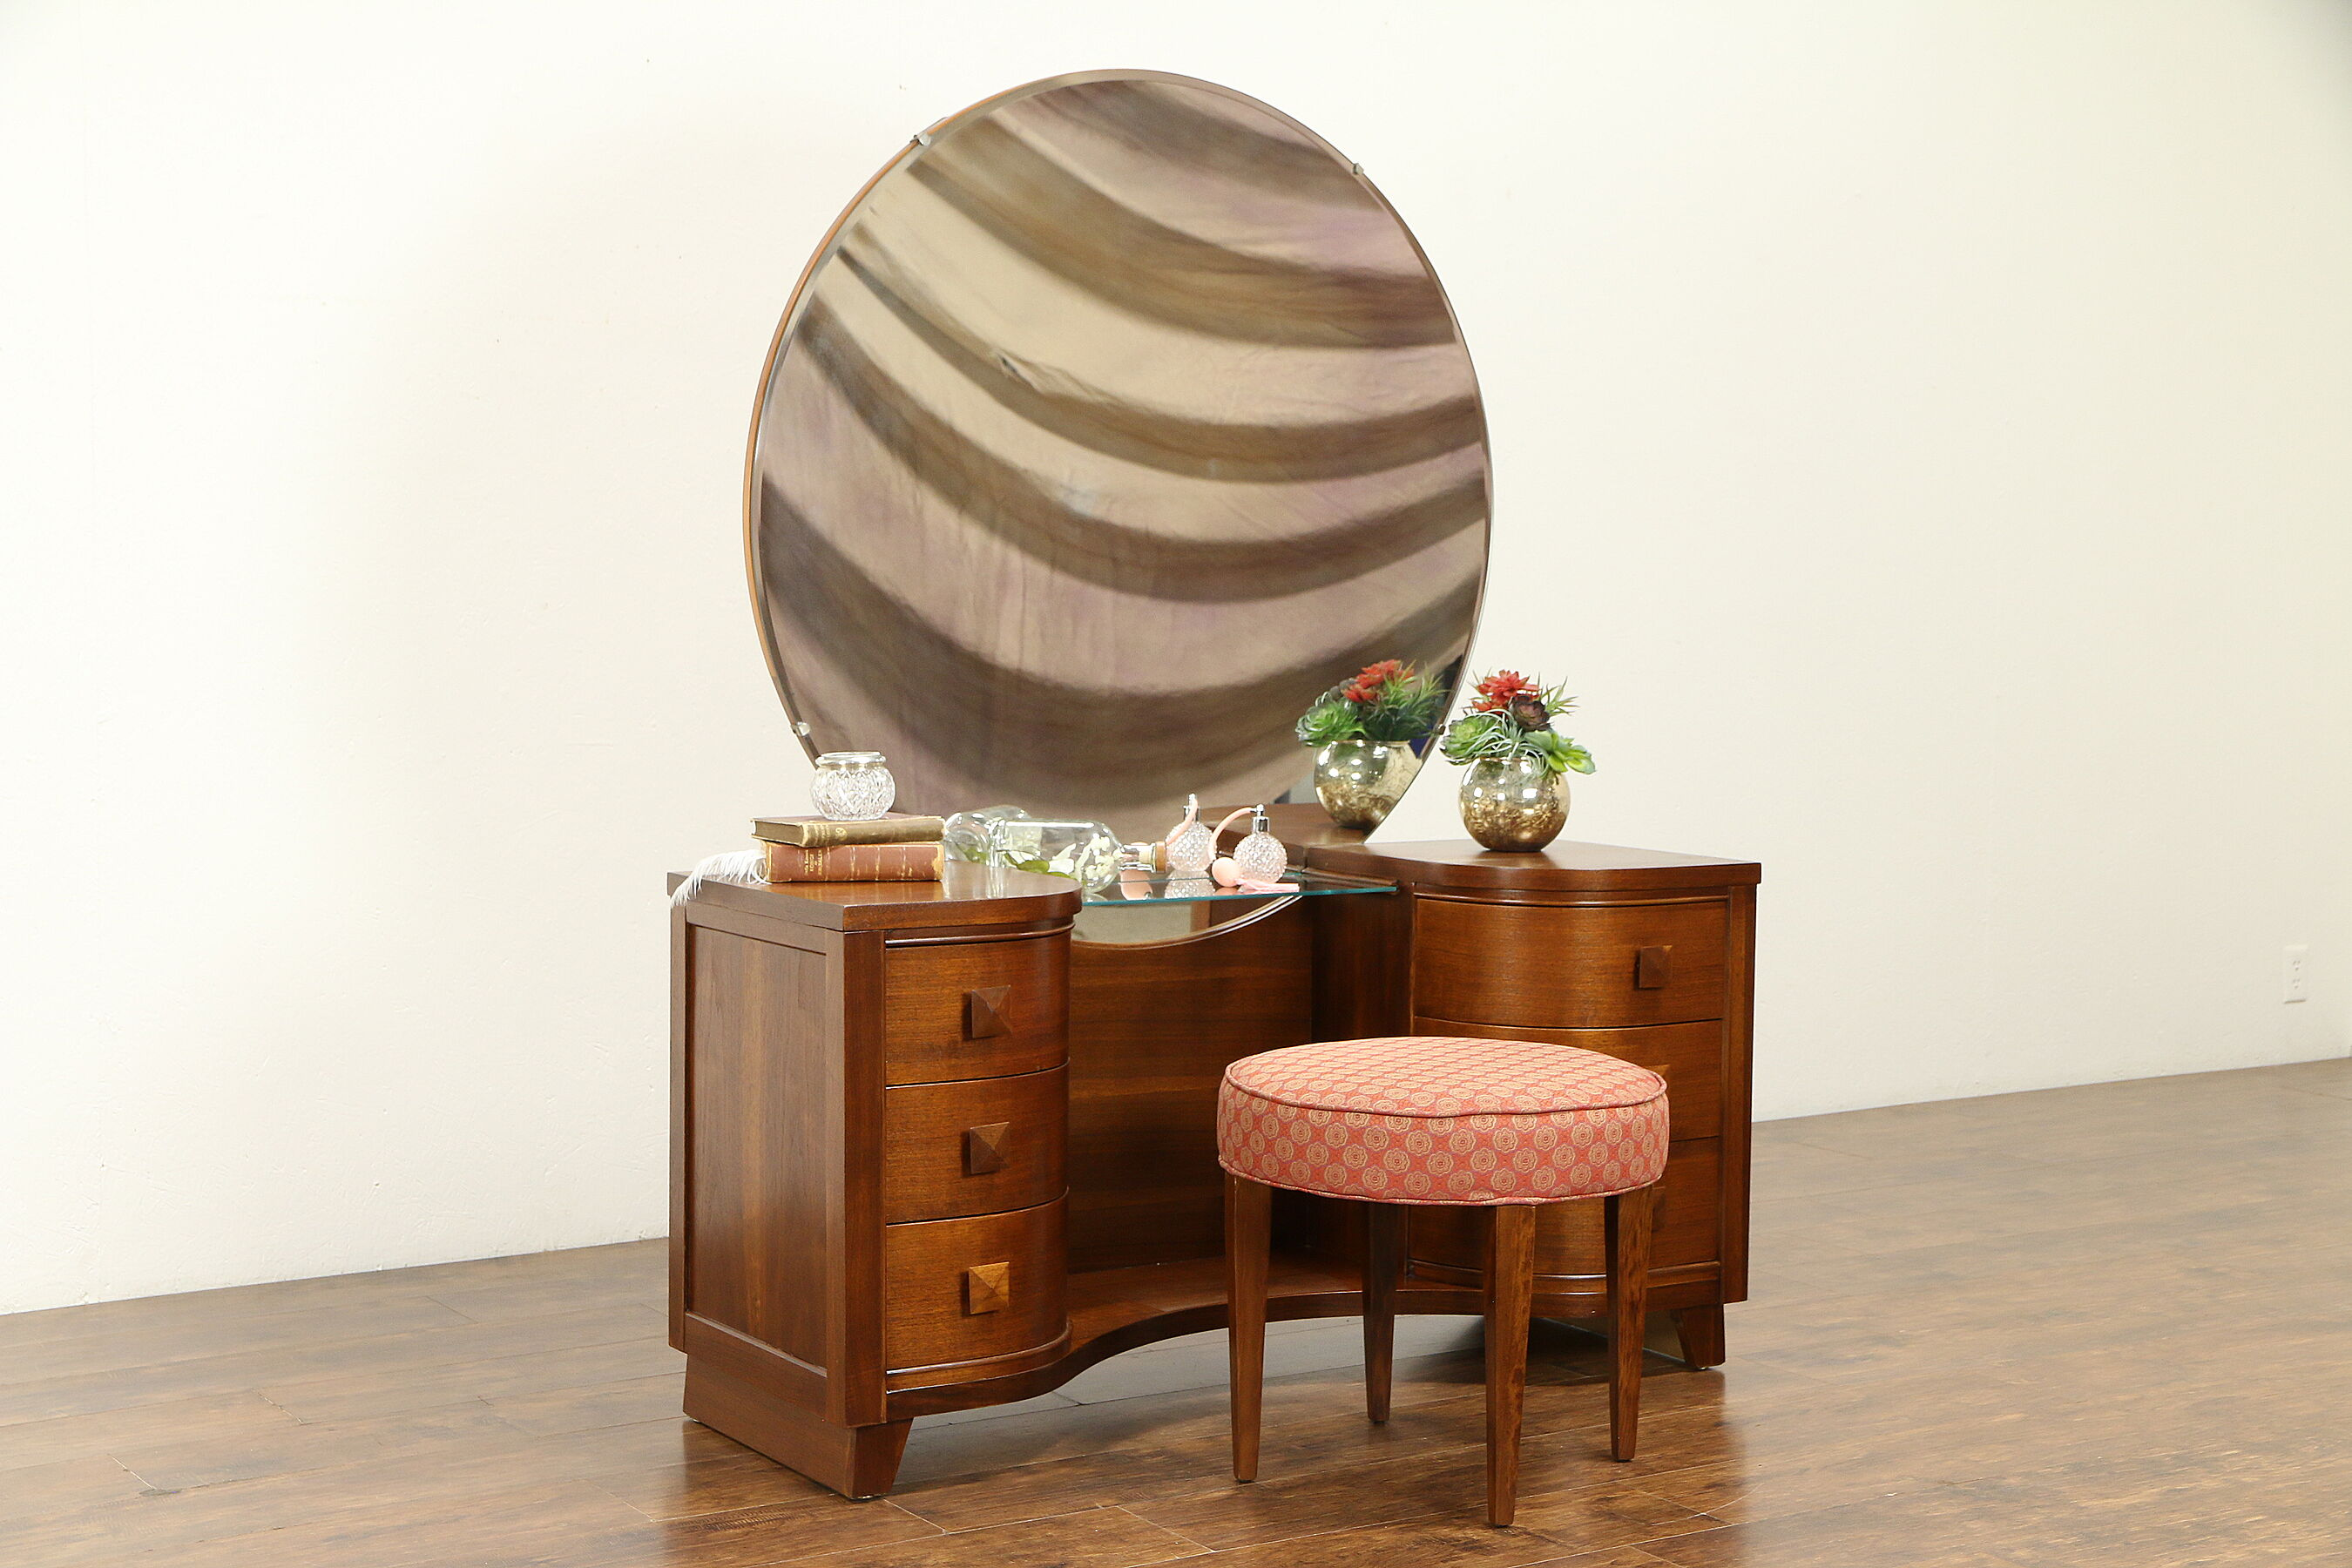 Sold Midcentury Modern 1950 S Vintage Walnut Vanity Or Dressing Table Stool 30931 Harp Gallery Antiques Furniture